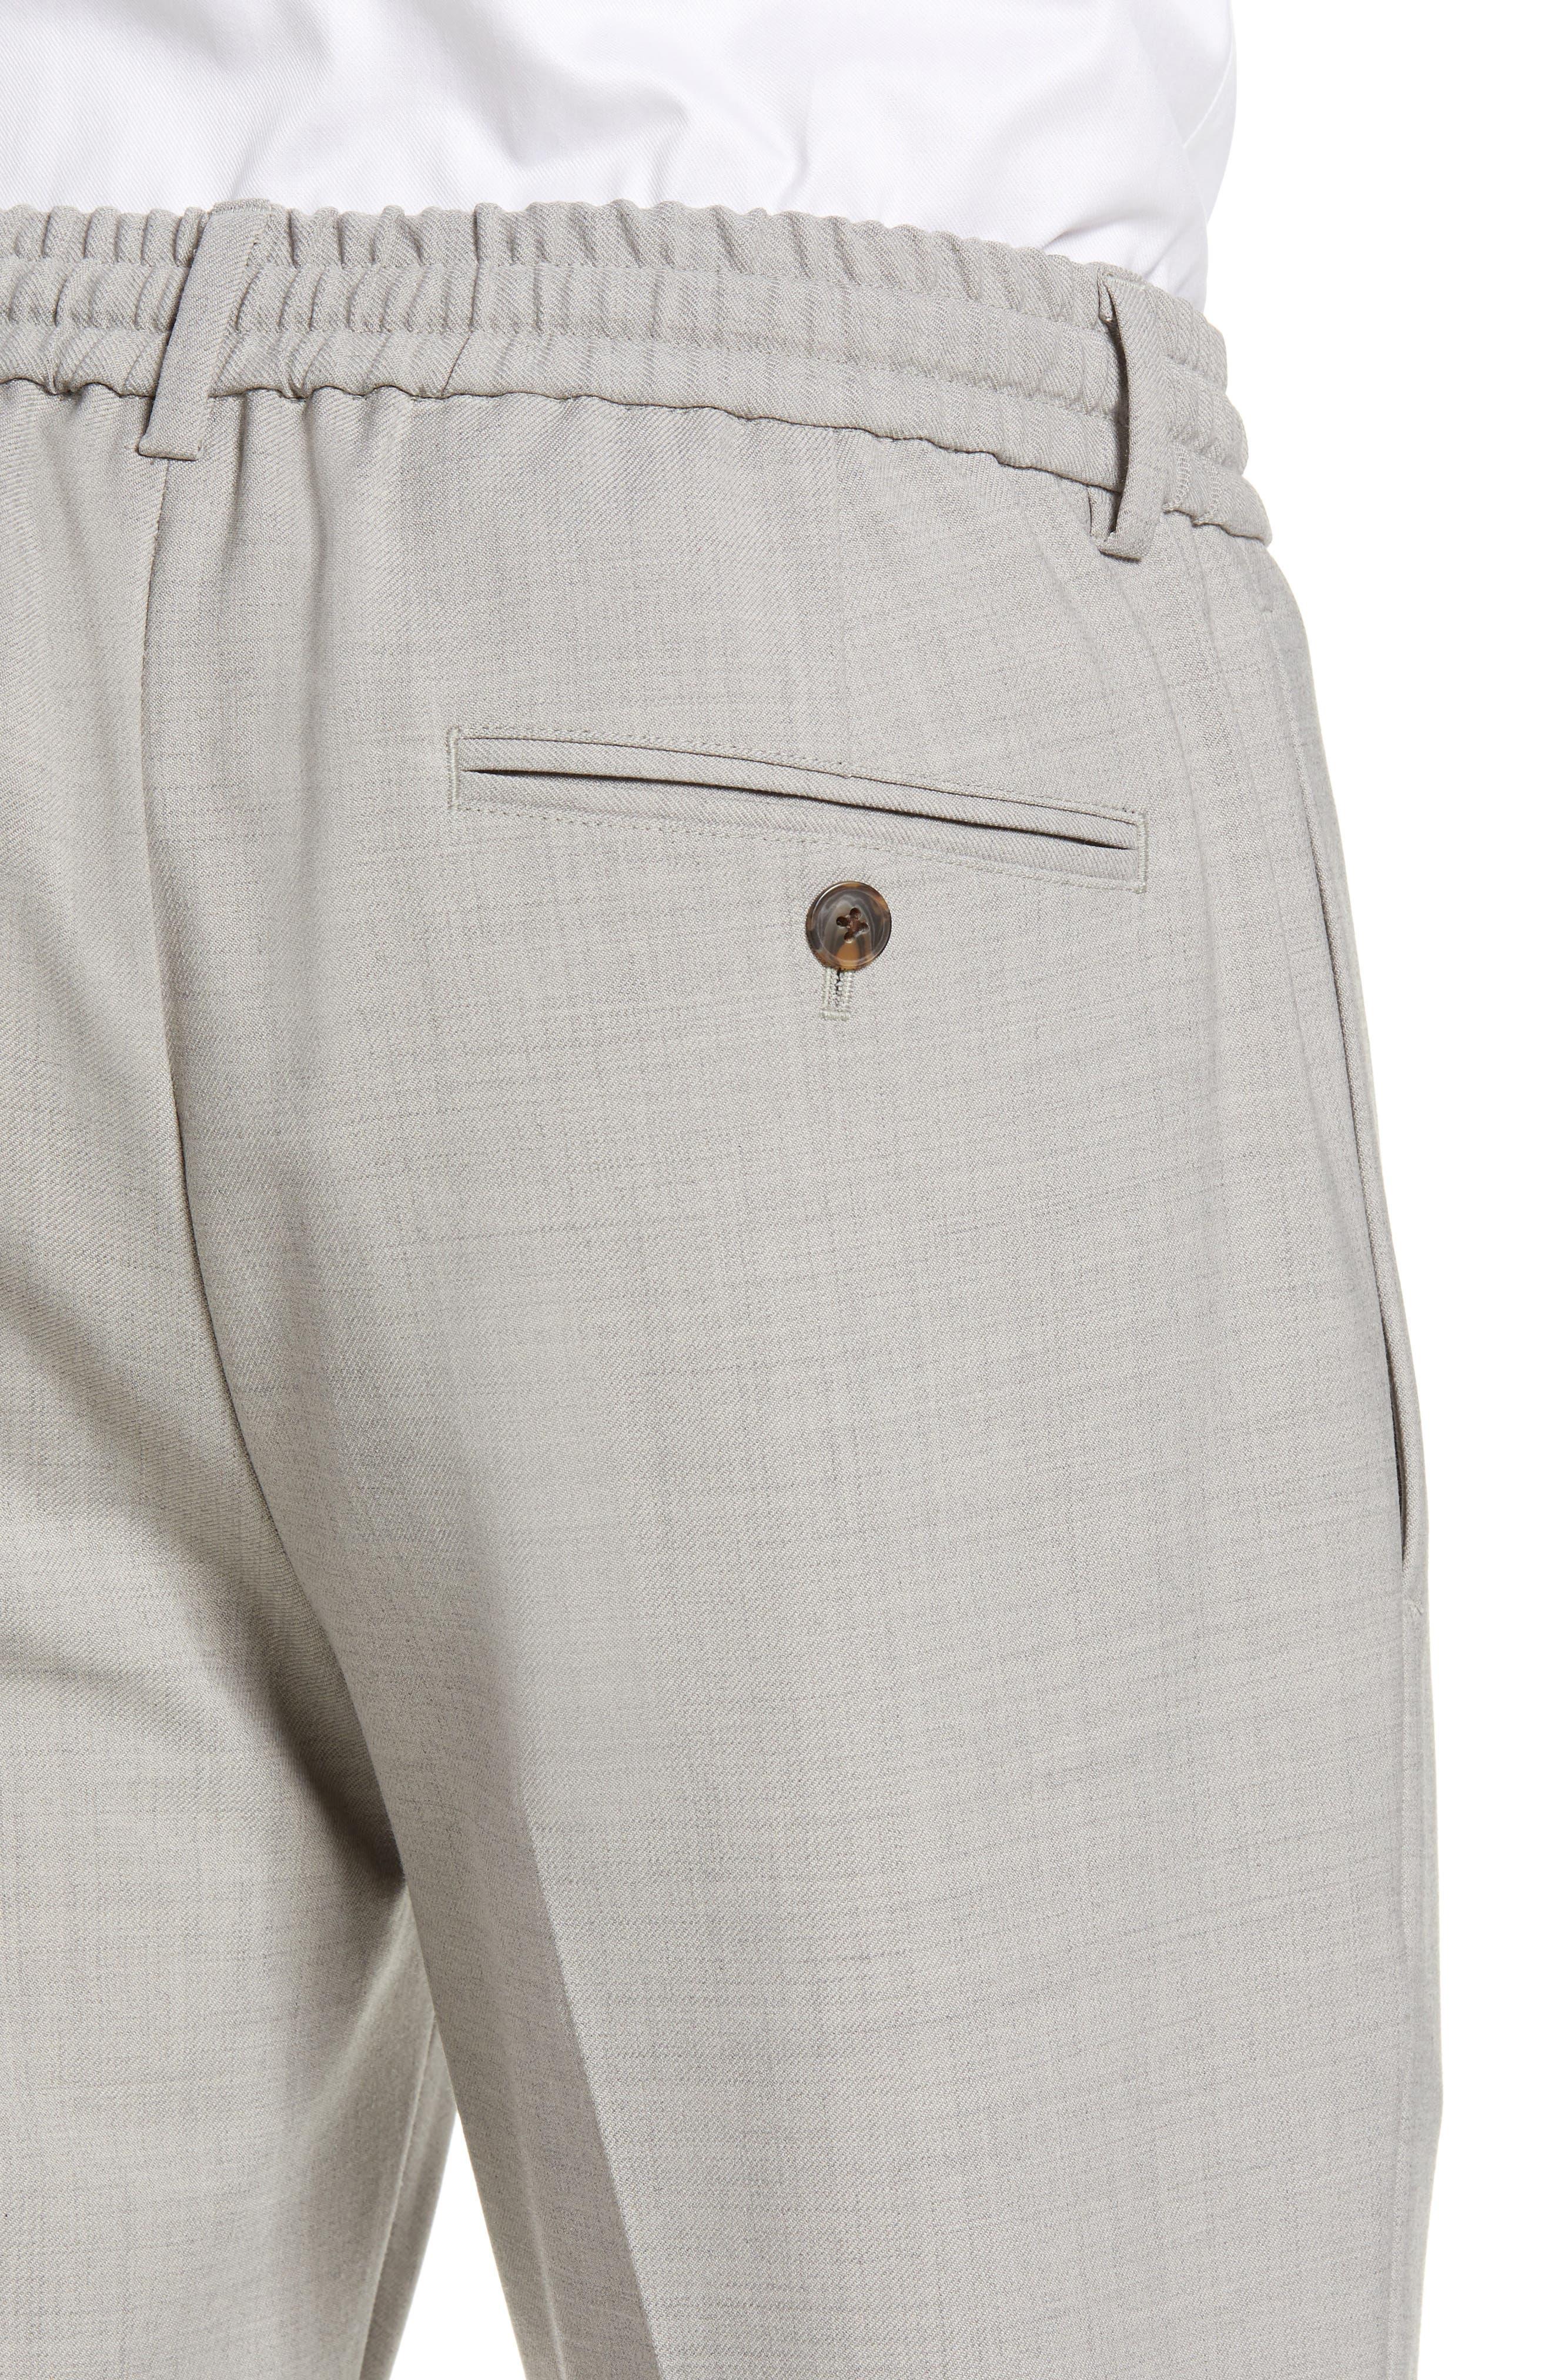 CLUB MONACO,                             Trim Fit Pintuck Pants,                             Alternate thumbnail 4, color,                             HEATHER GREY